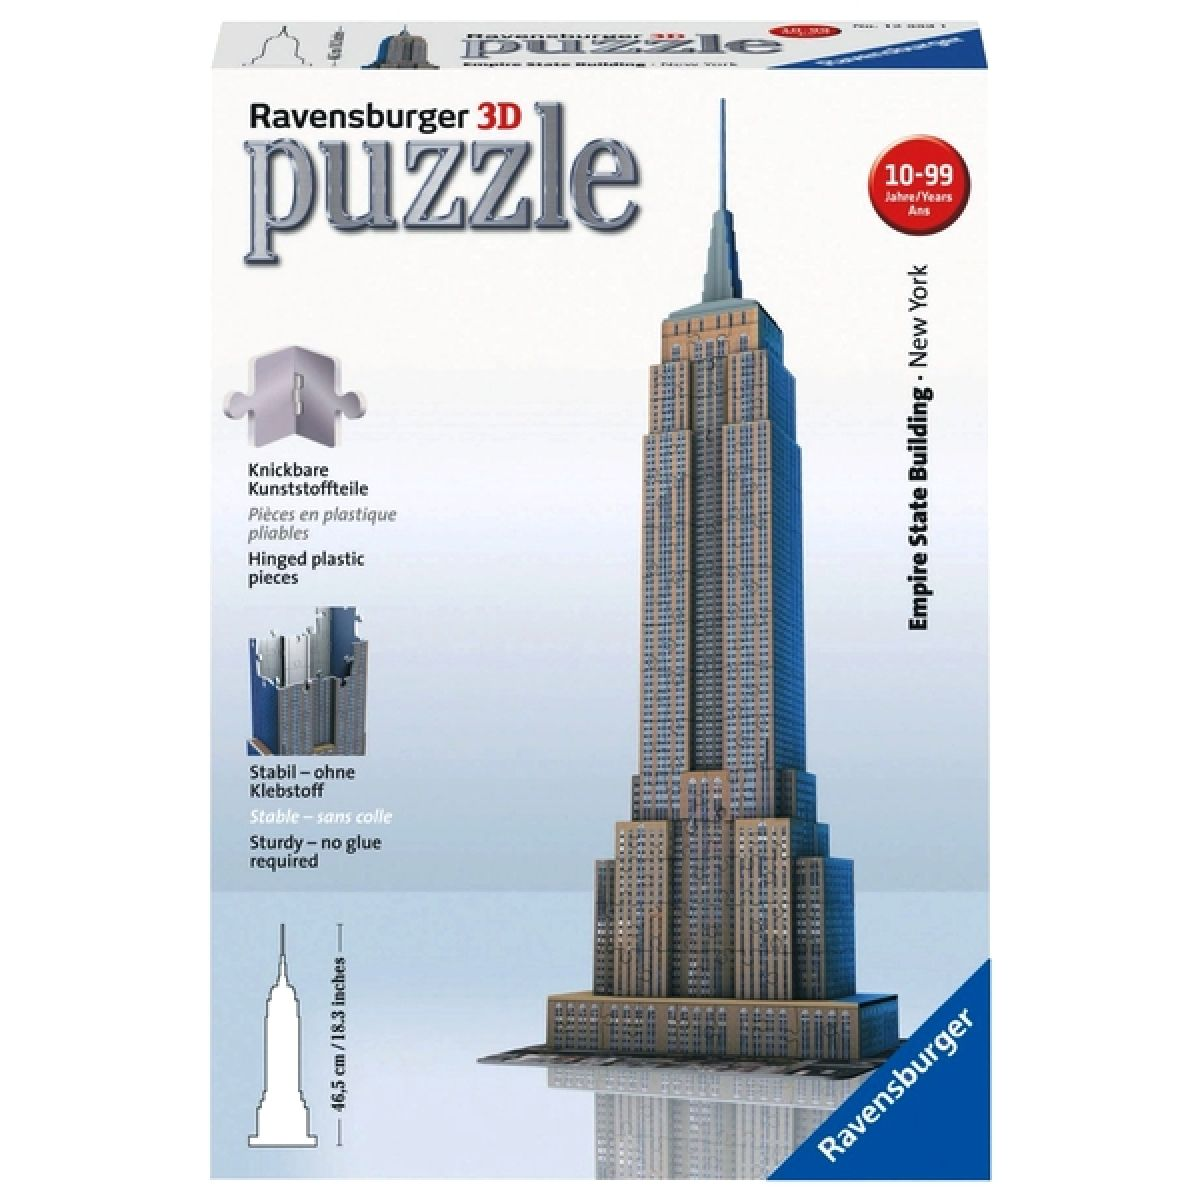 Ravensburger 3D Empire State Building 216 dílků